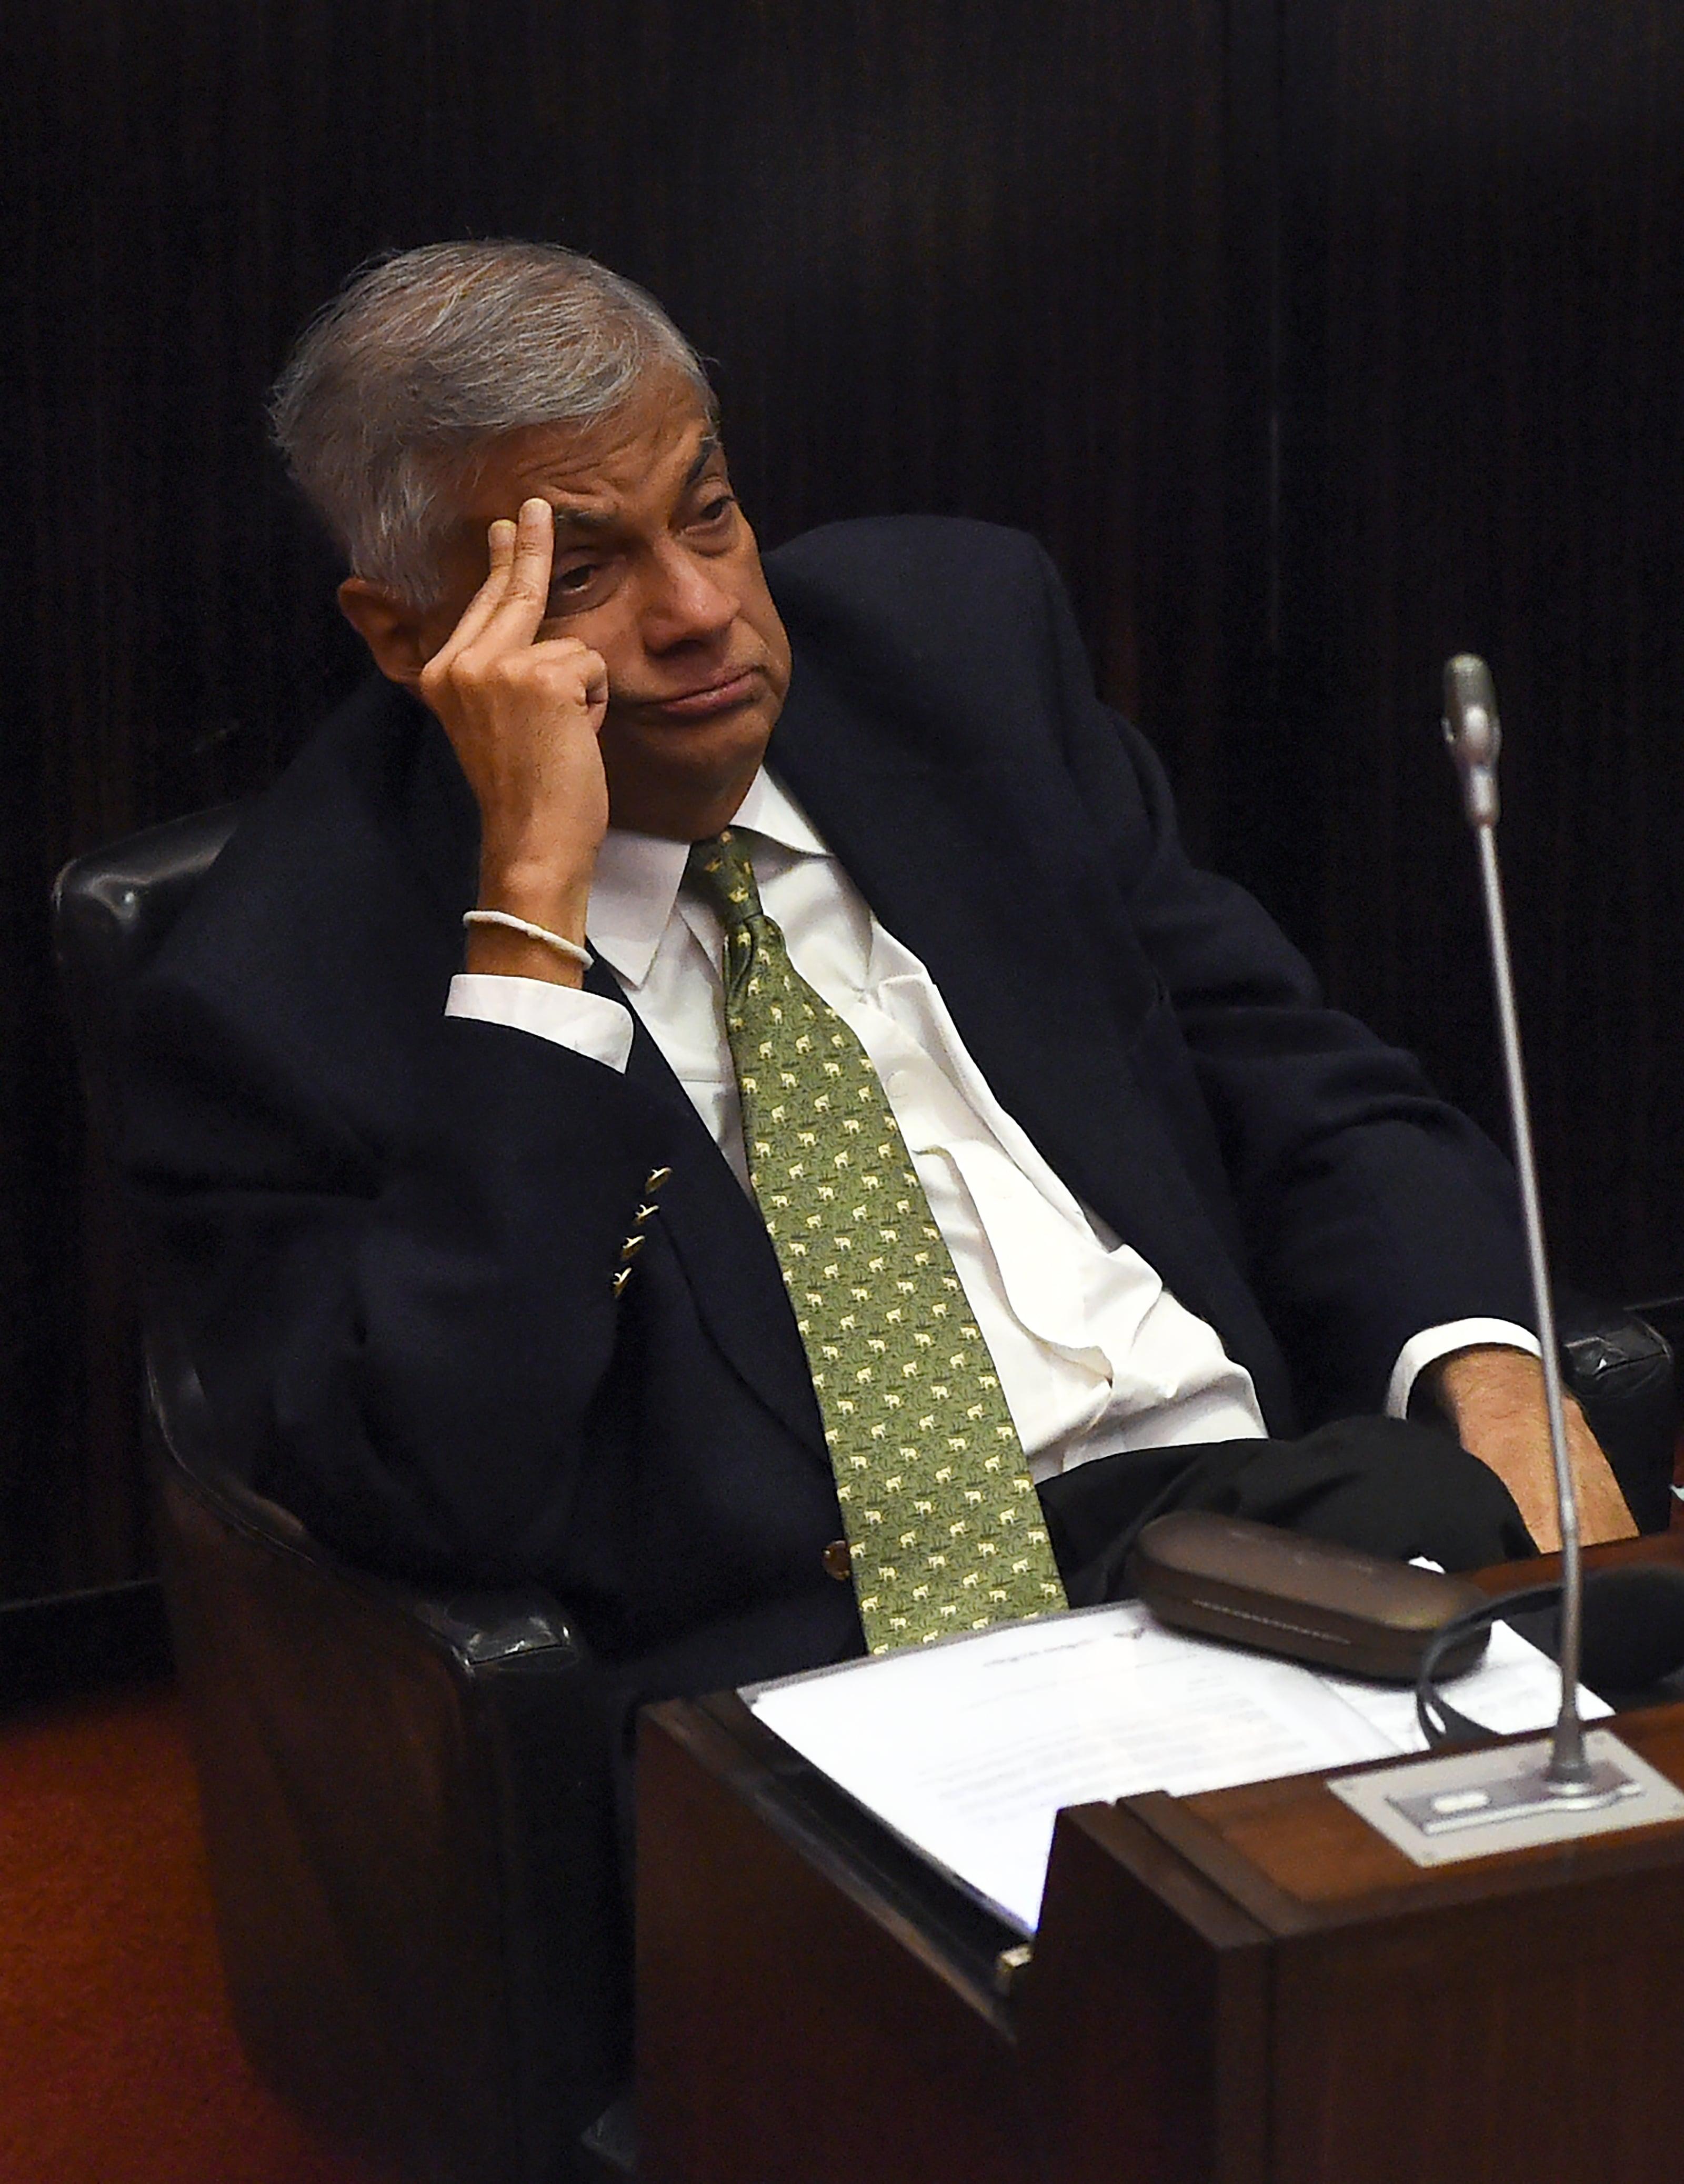 Srilanka's Crisis